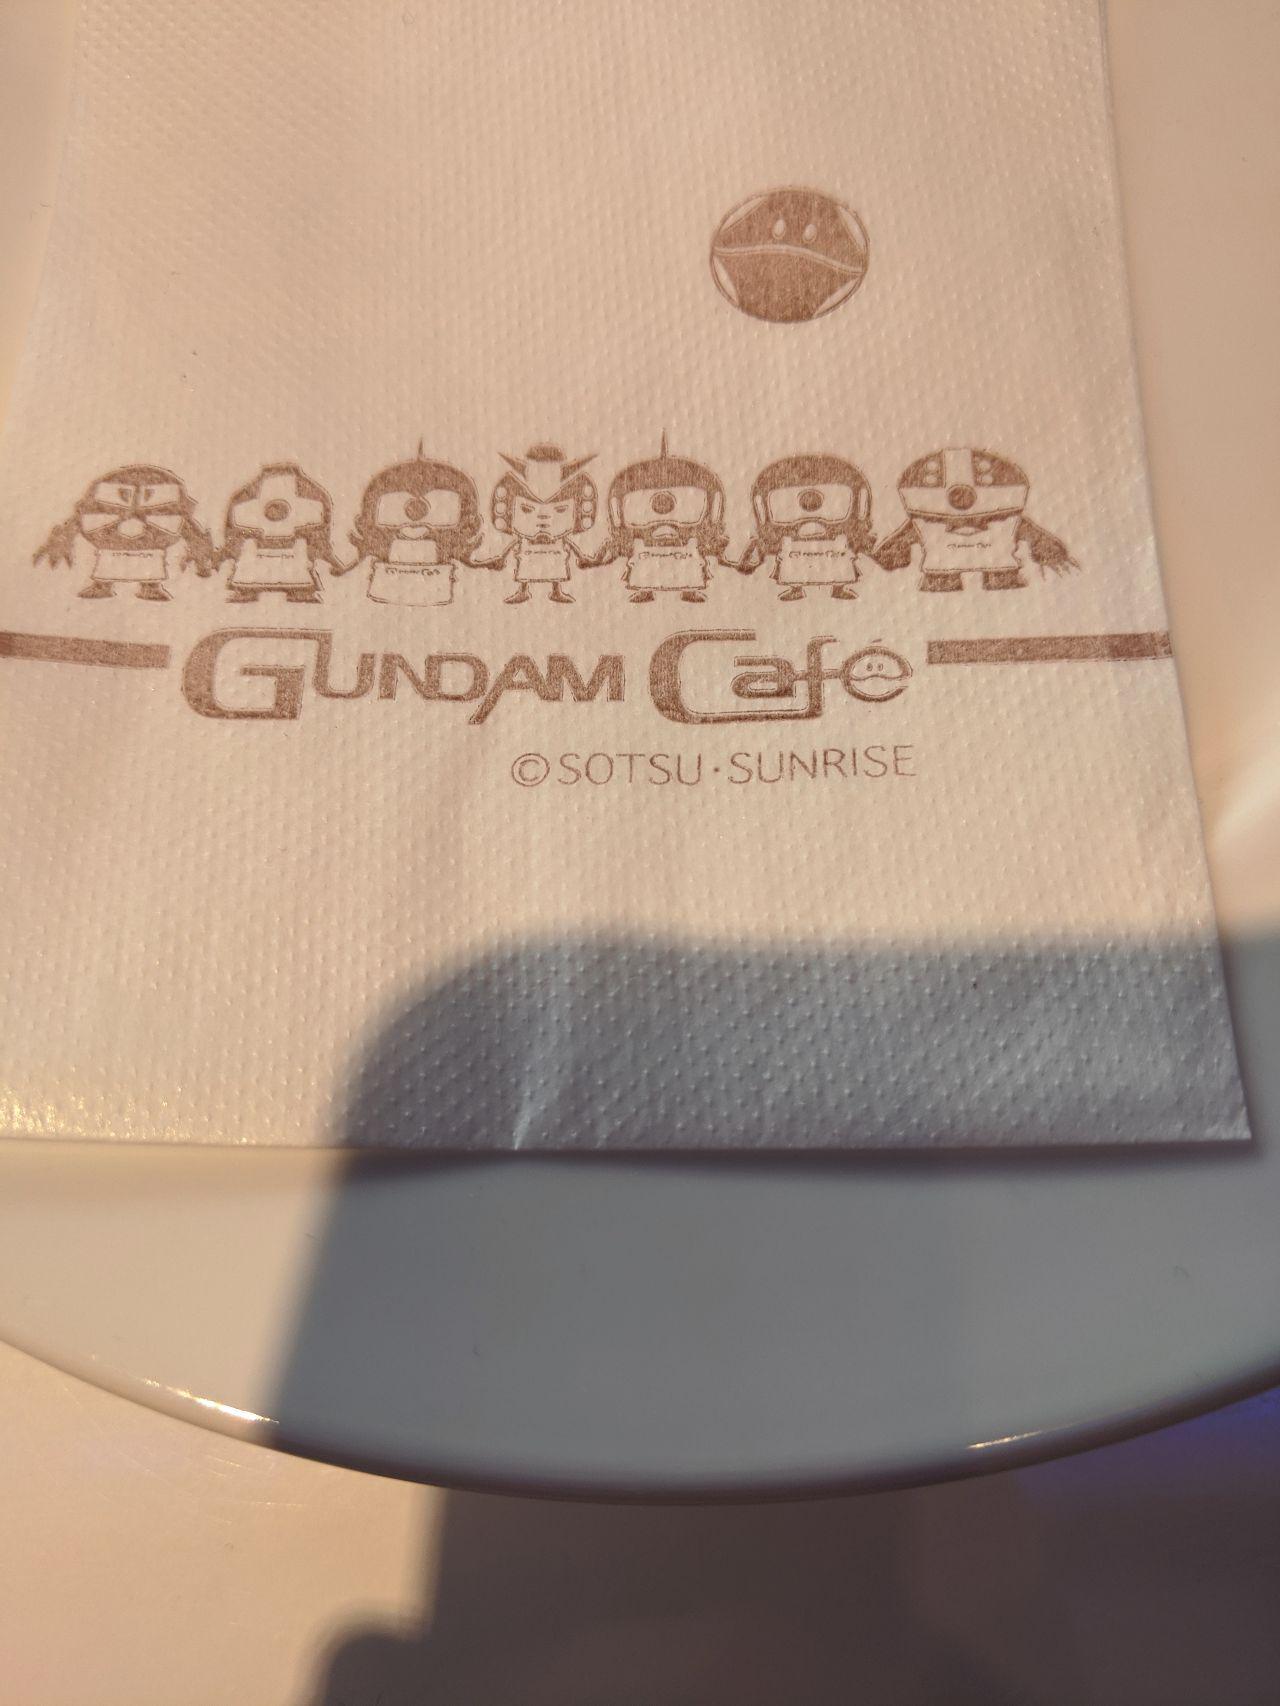 Gundam Cafe 5